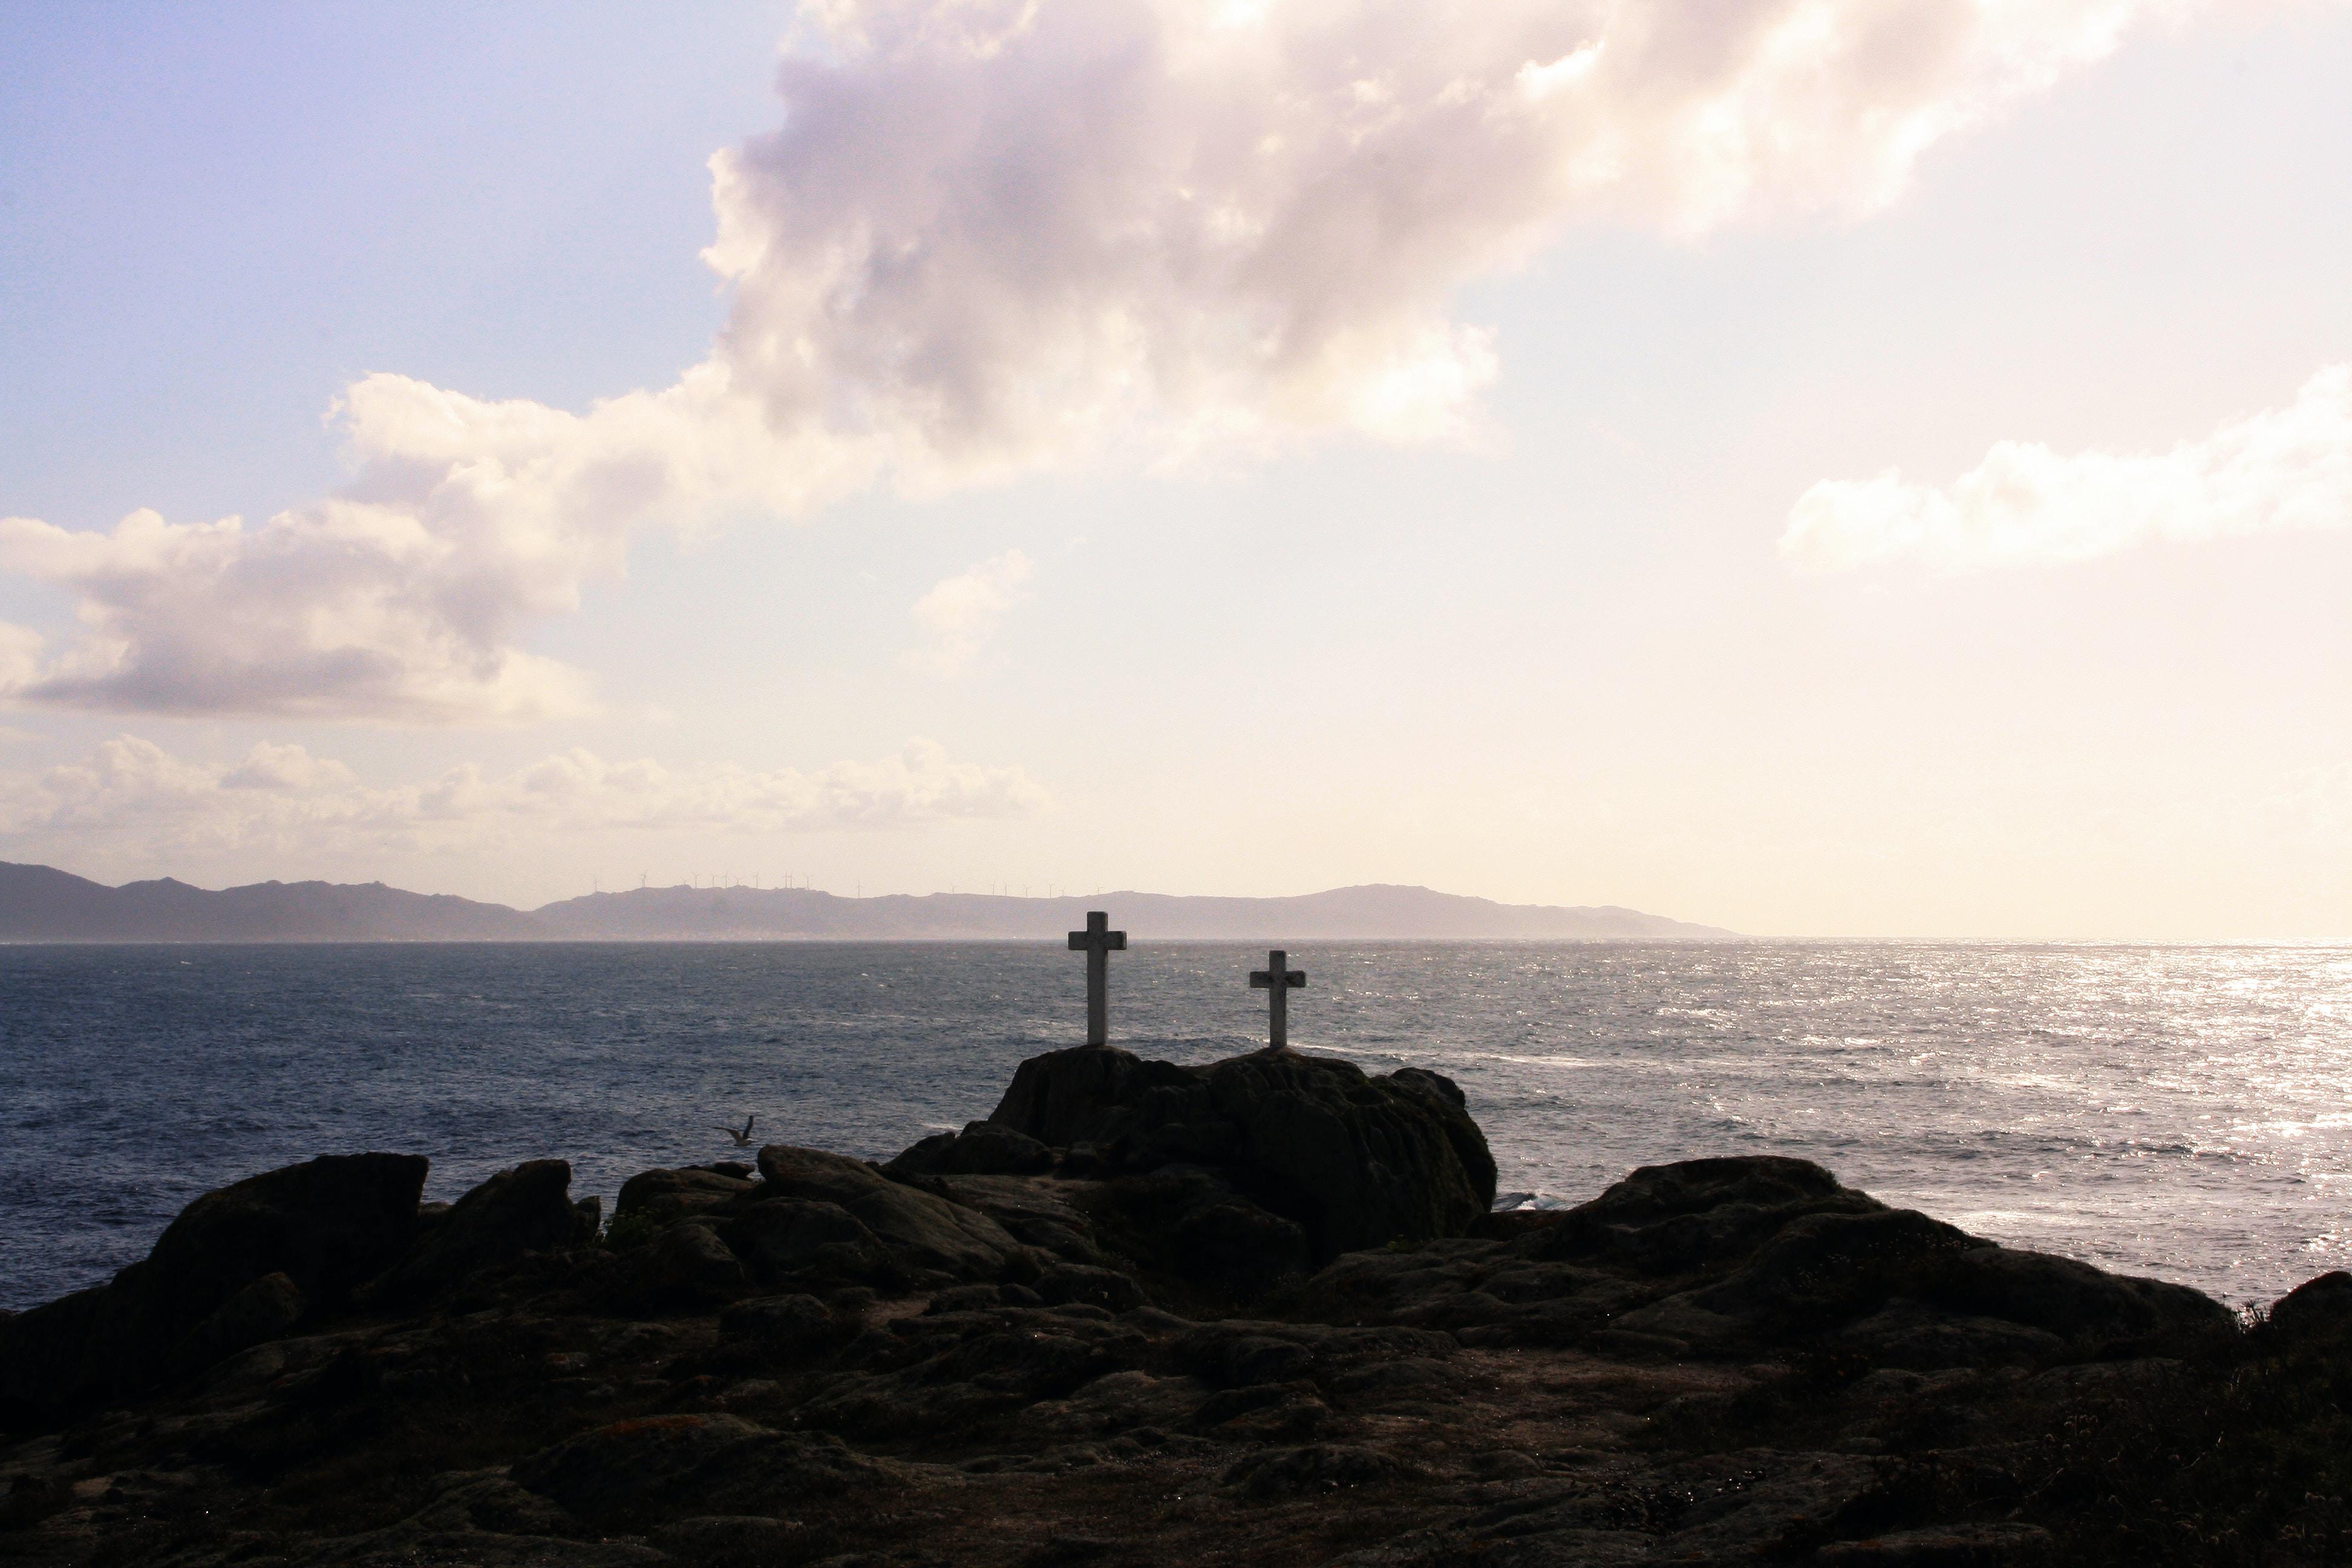 Two little wooden crosses sitting on top of a rock cliff near an ocean.